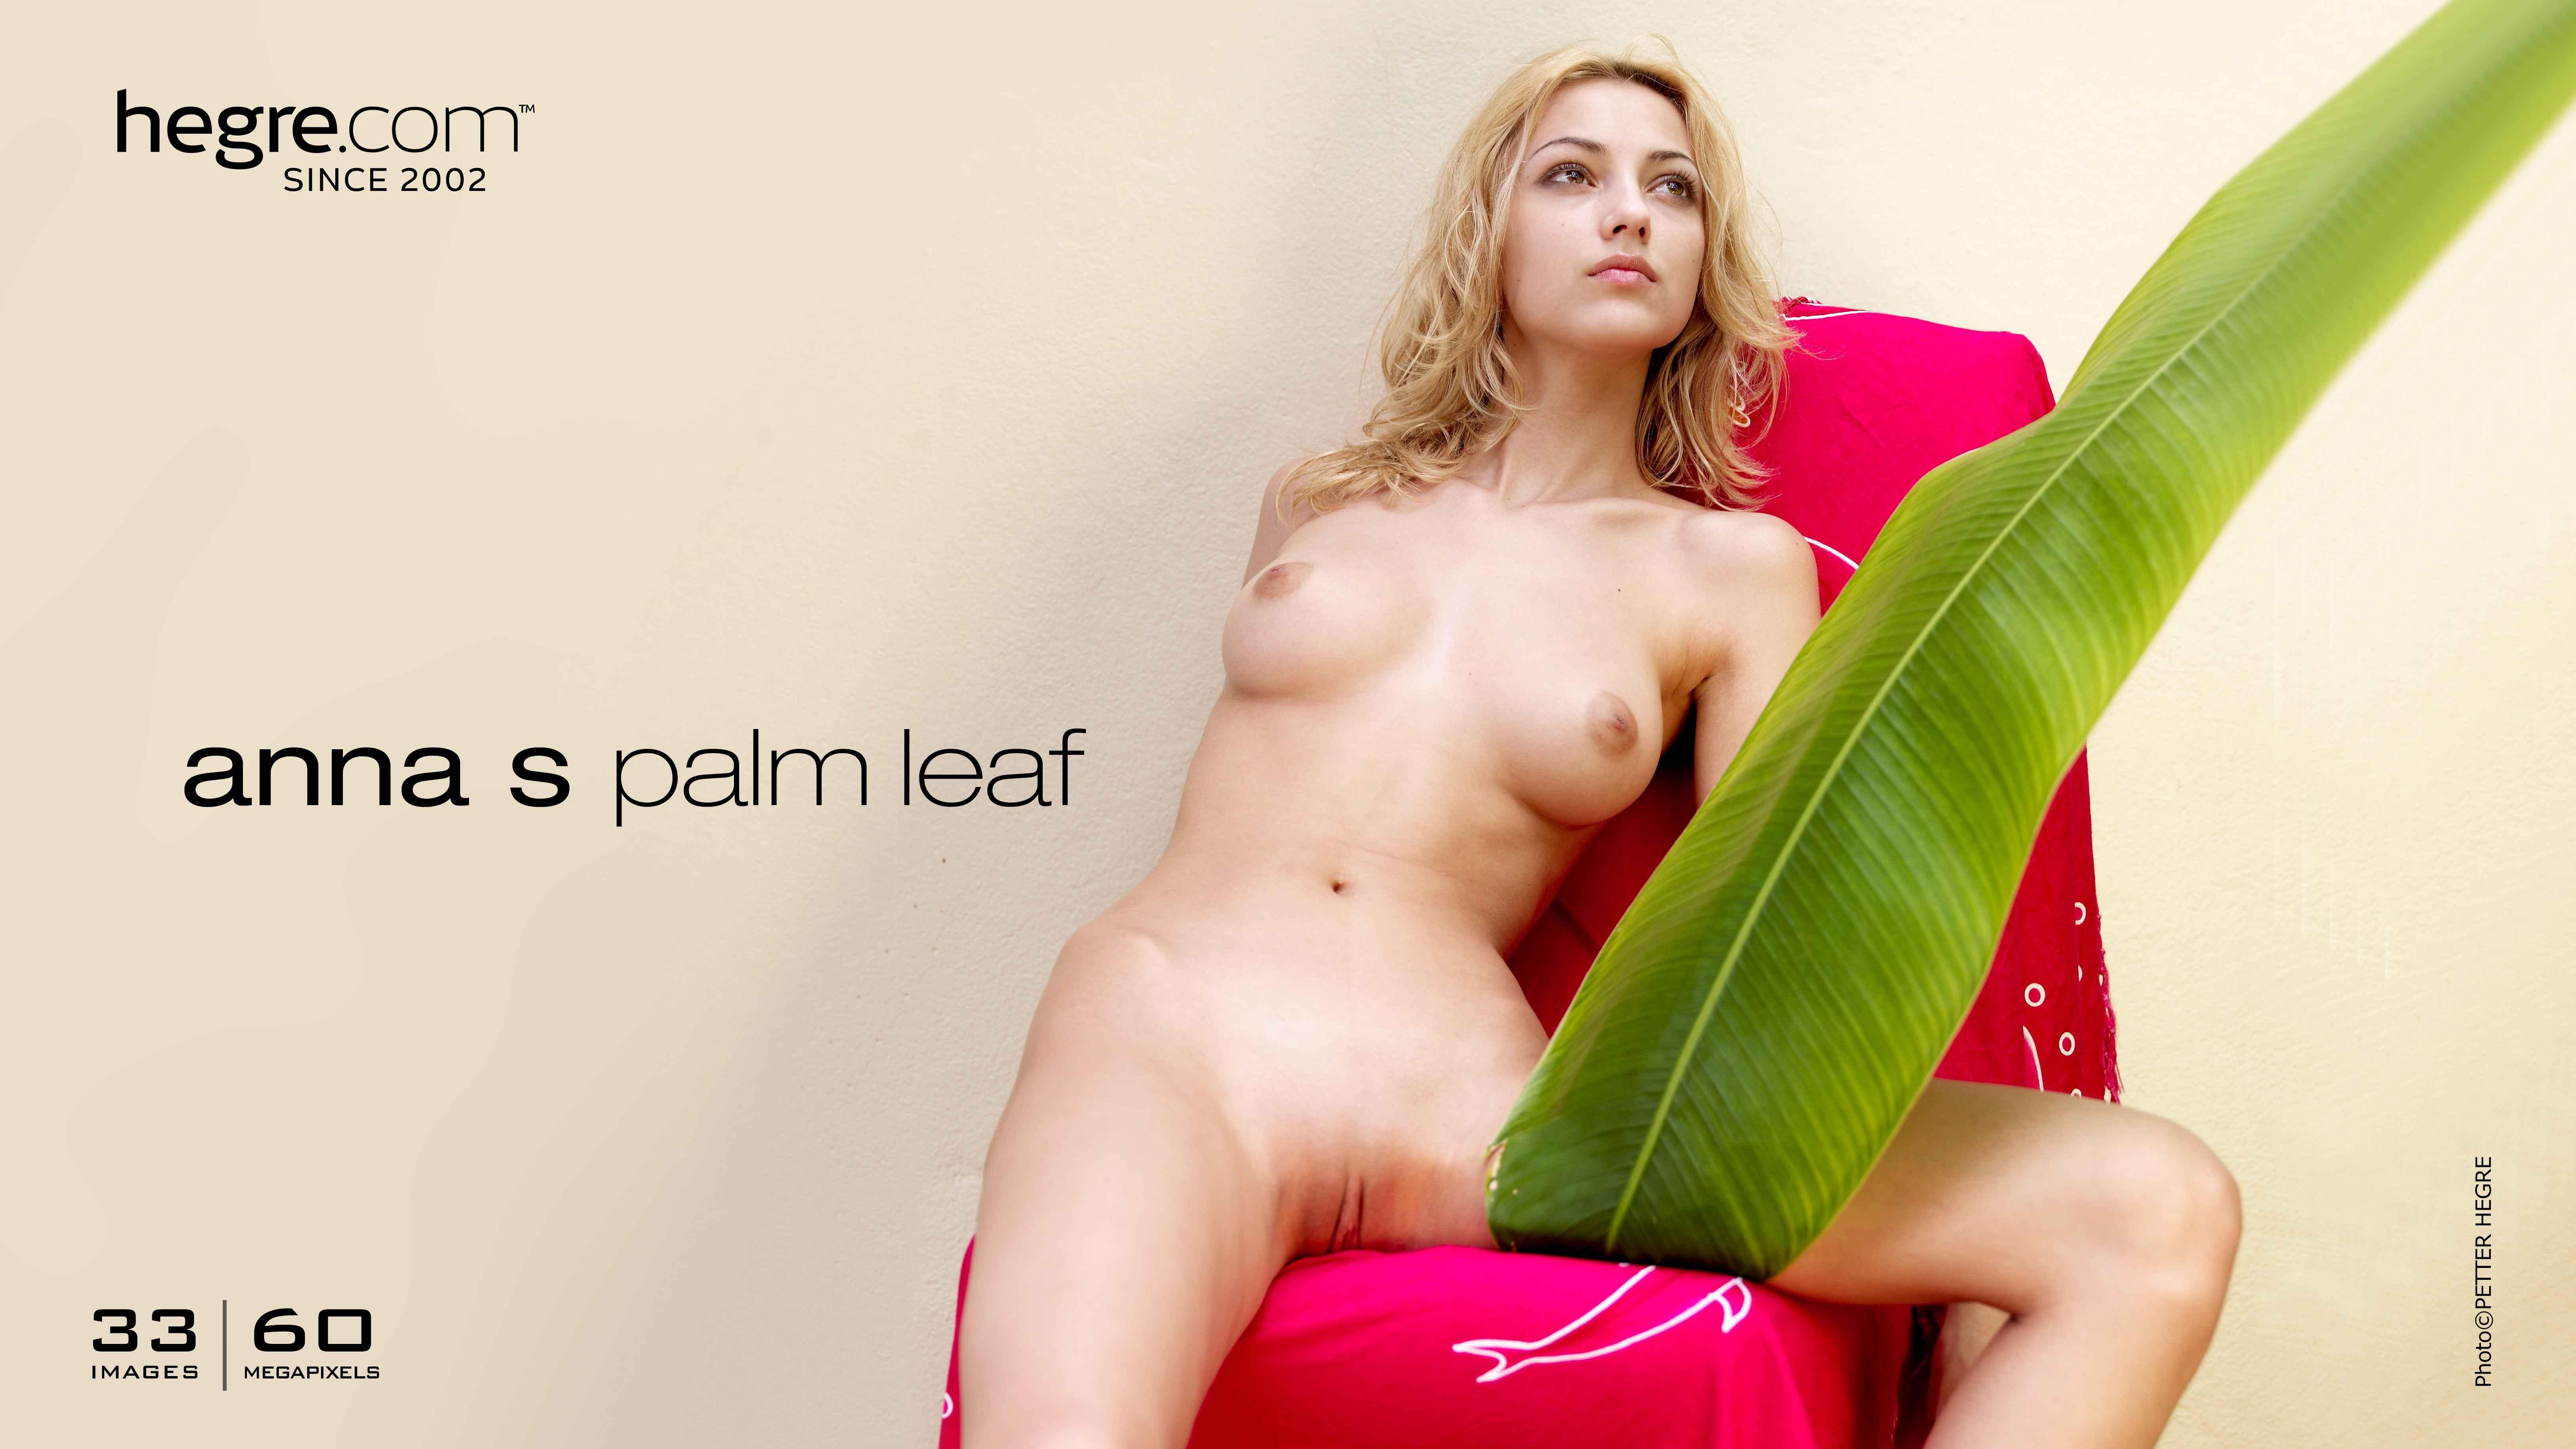 Anna S palm leaf